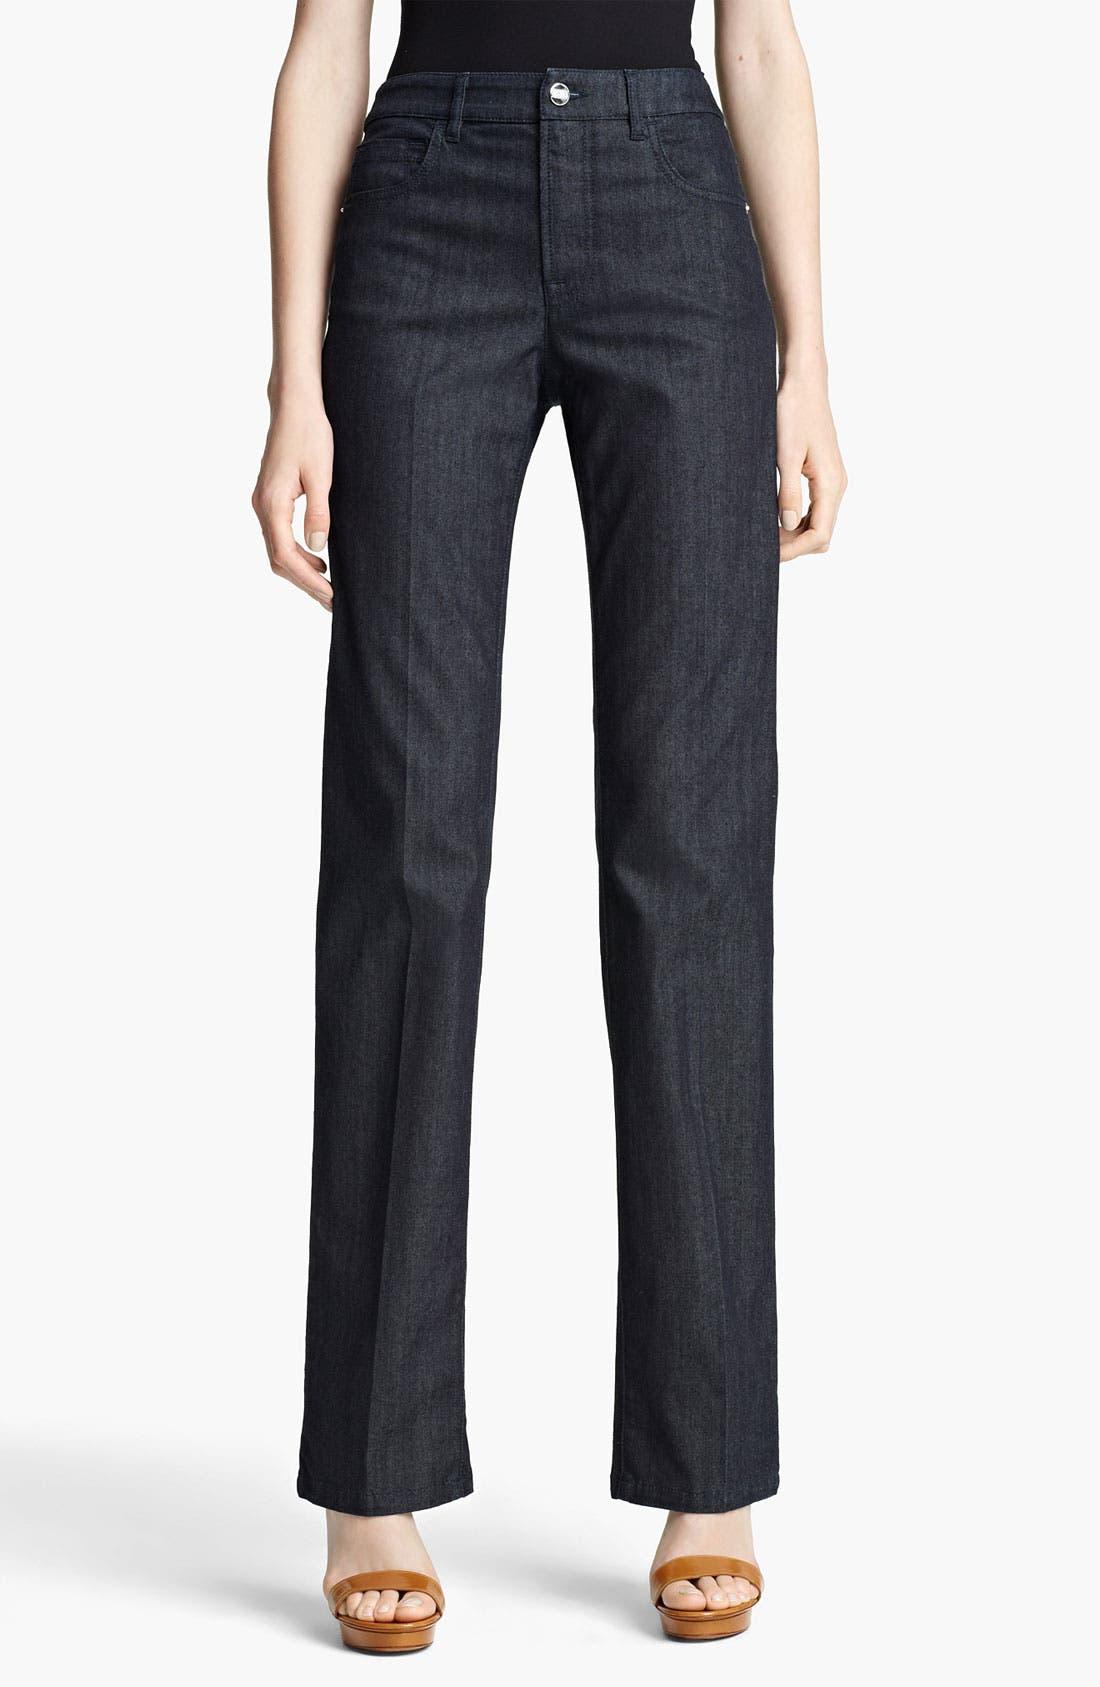 Alternate Image 1 Selected - Armani Collezioni Straight Leg Stretch Jeans